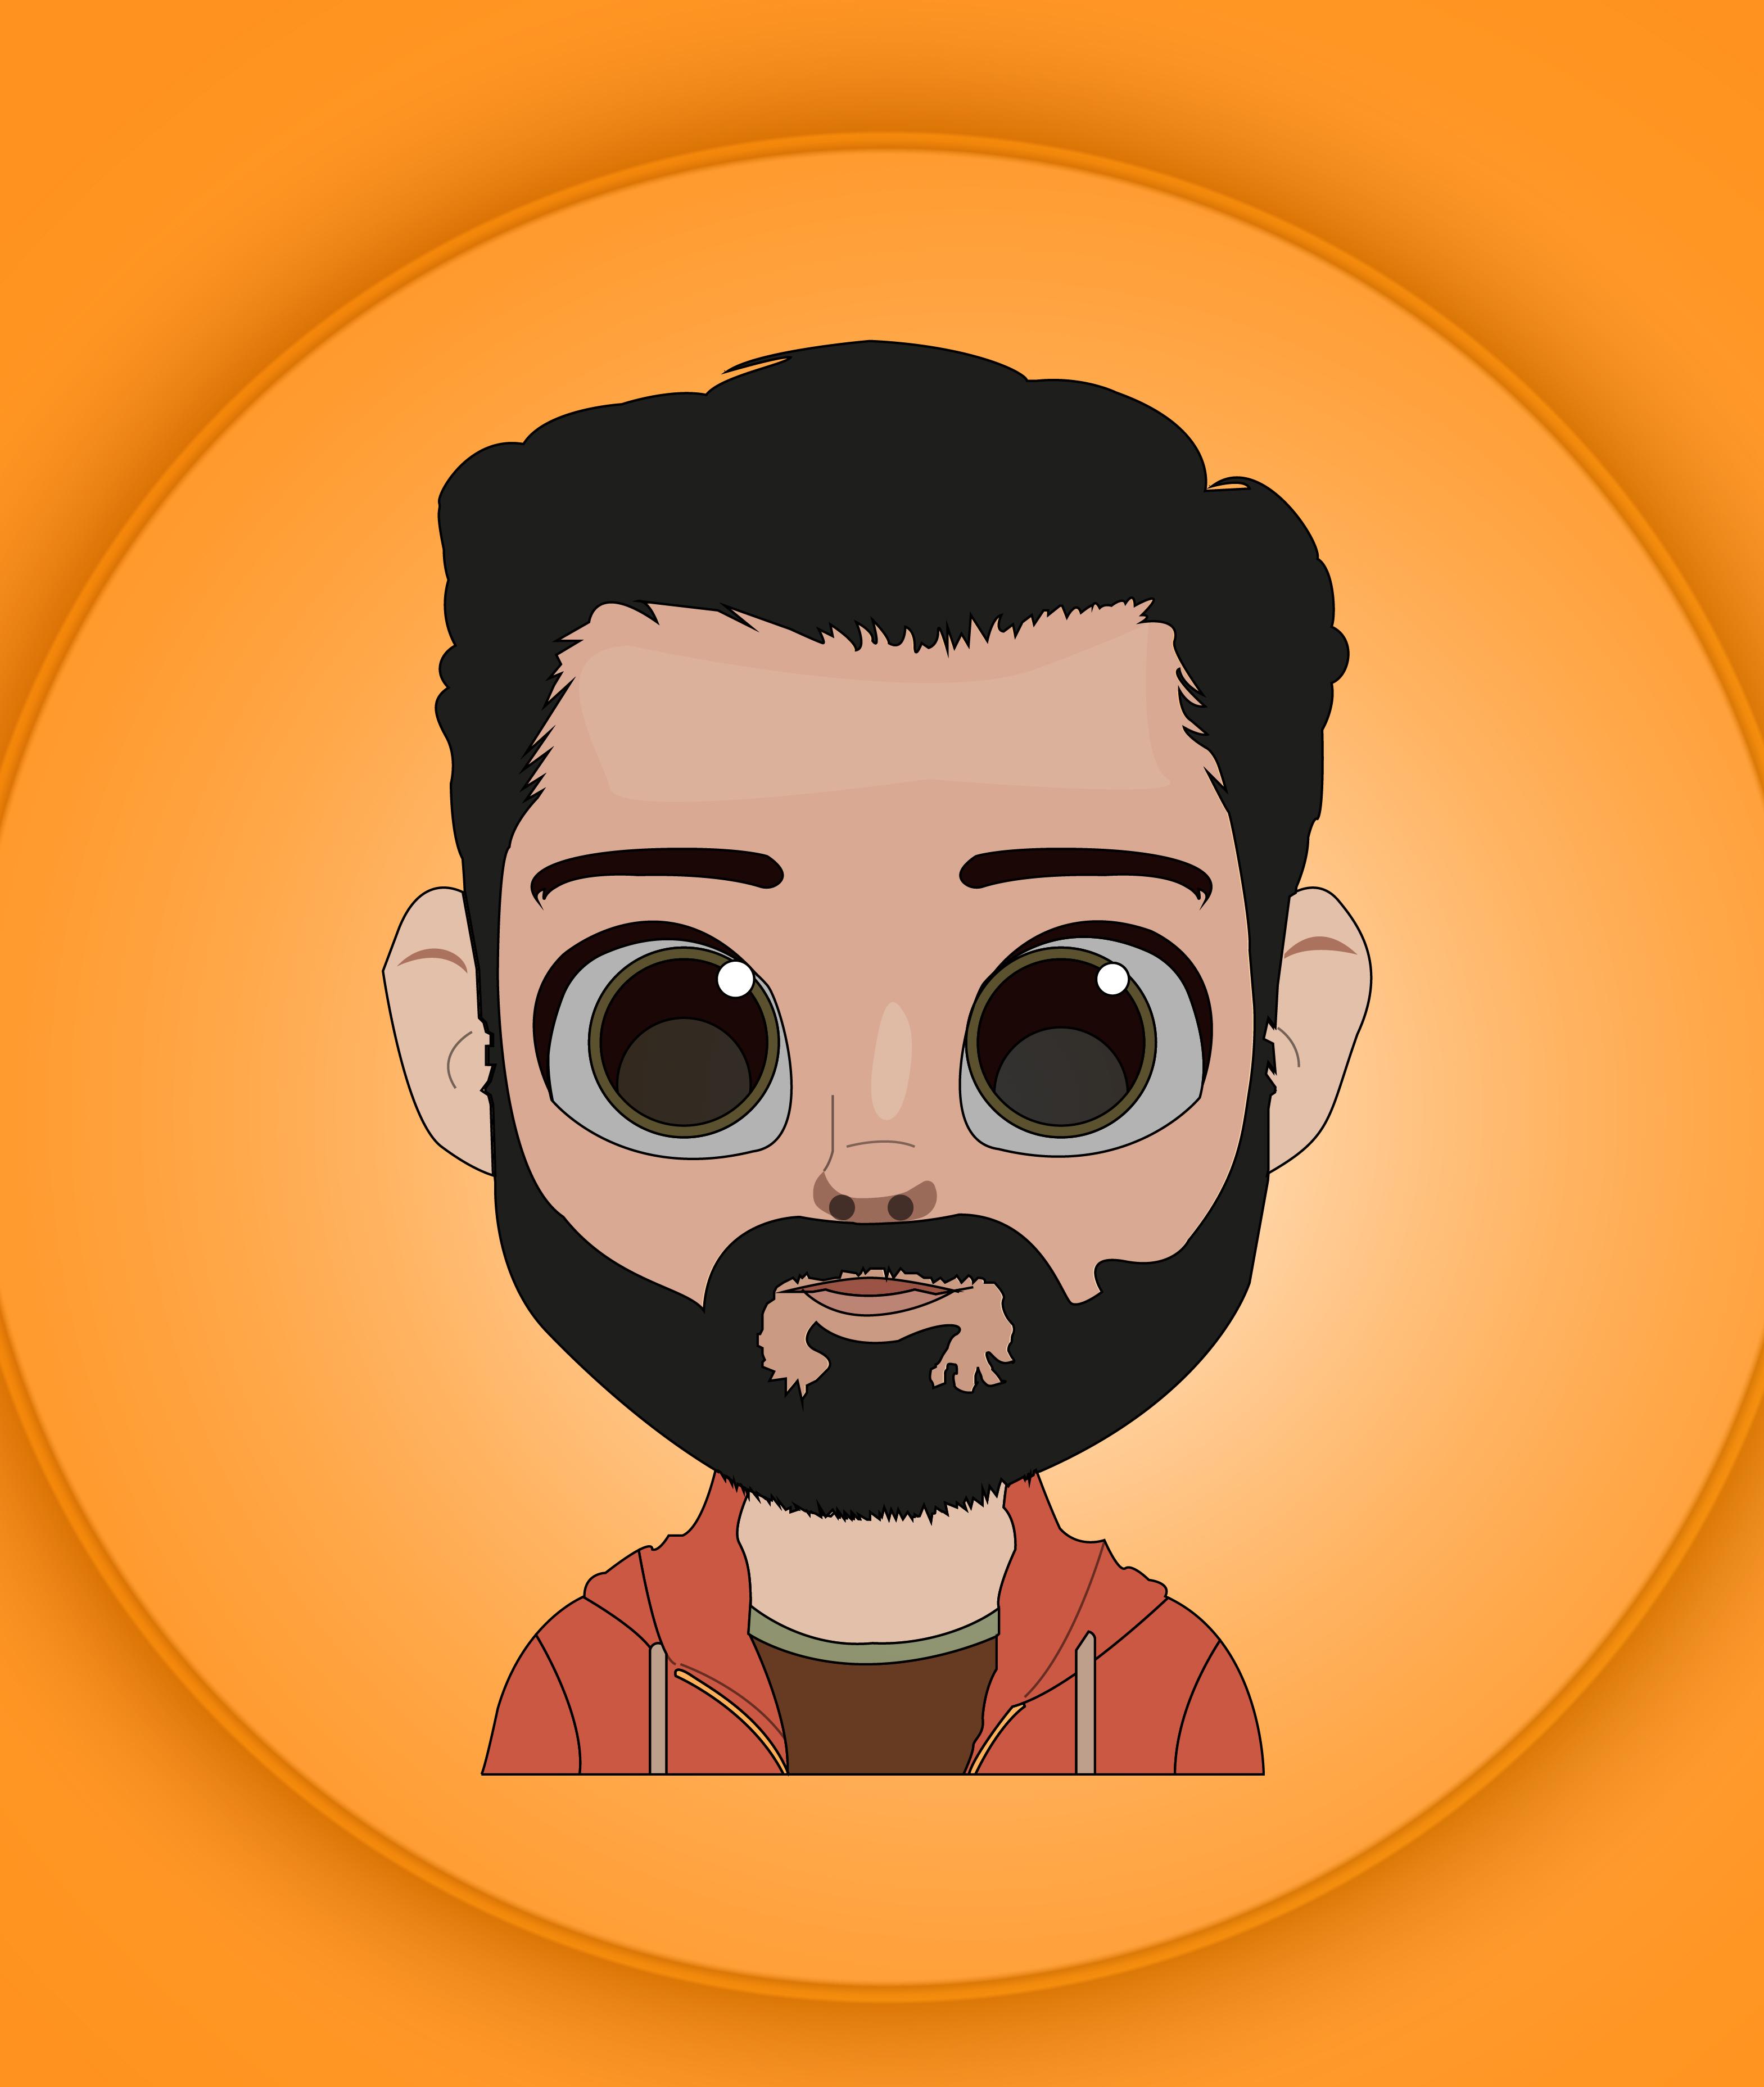 i will make mascot logo design for you